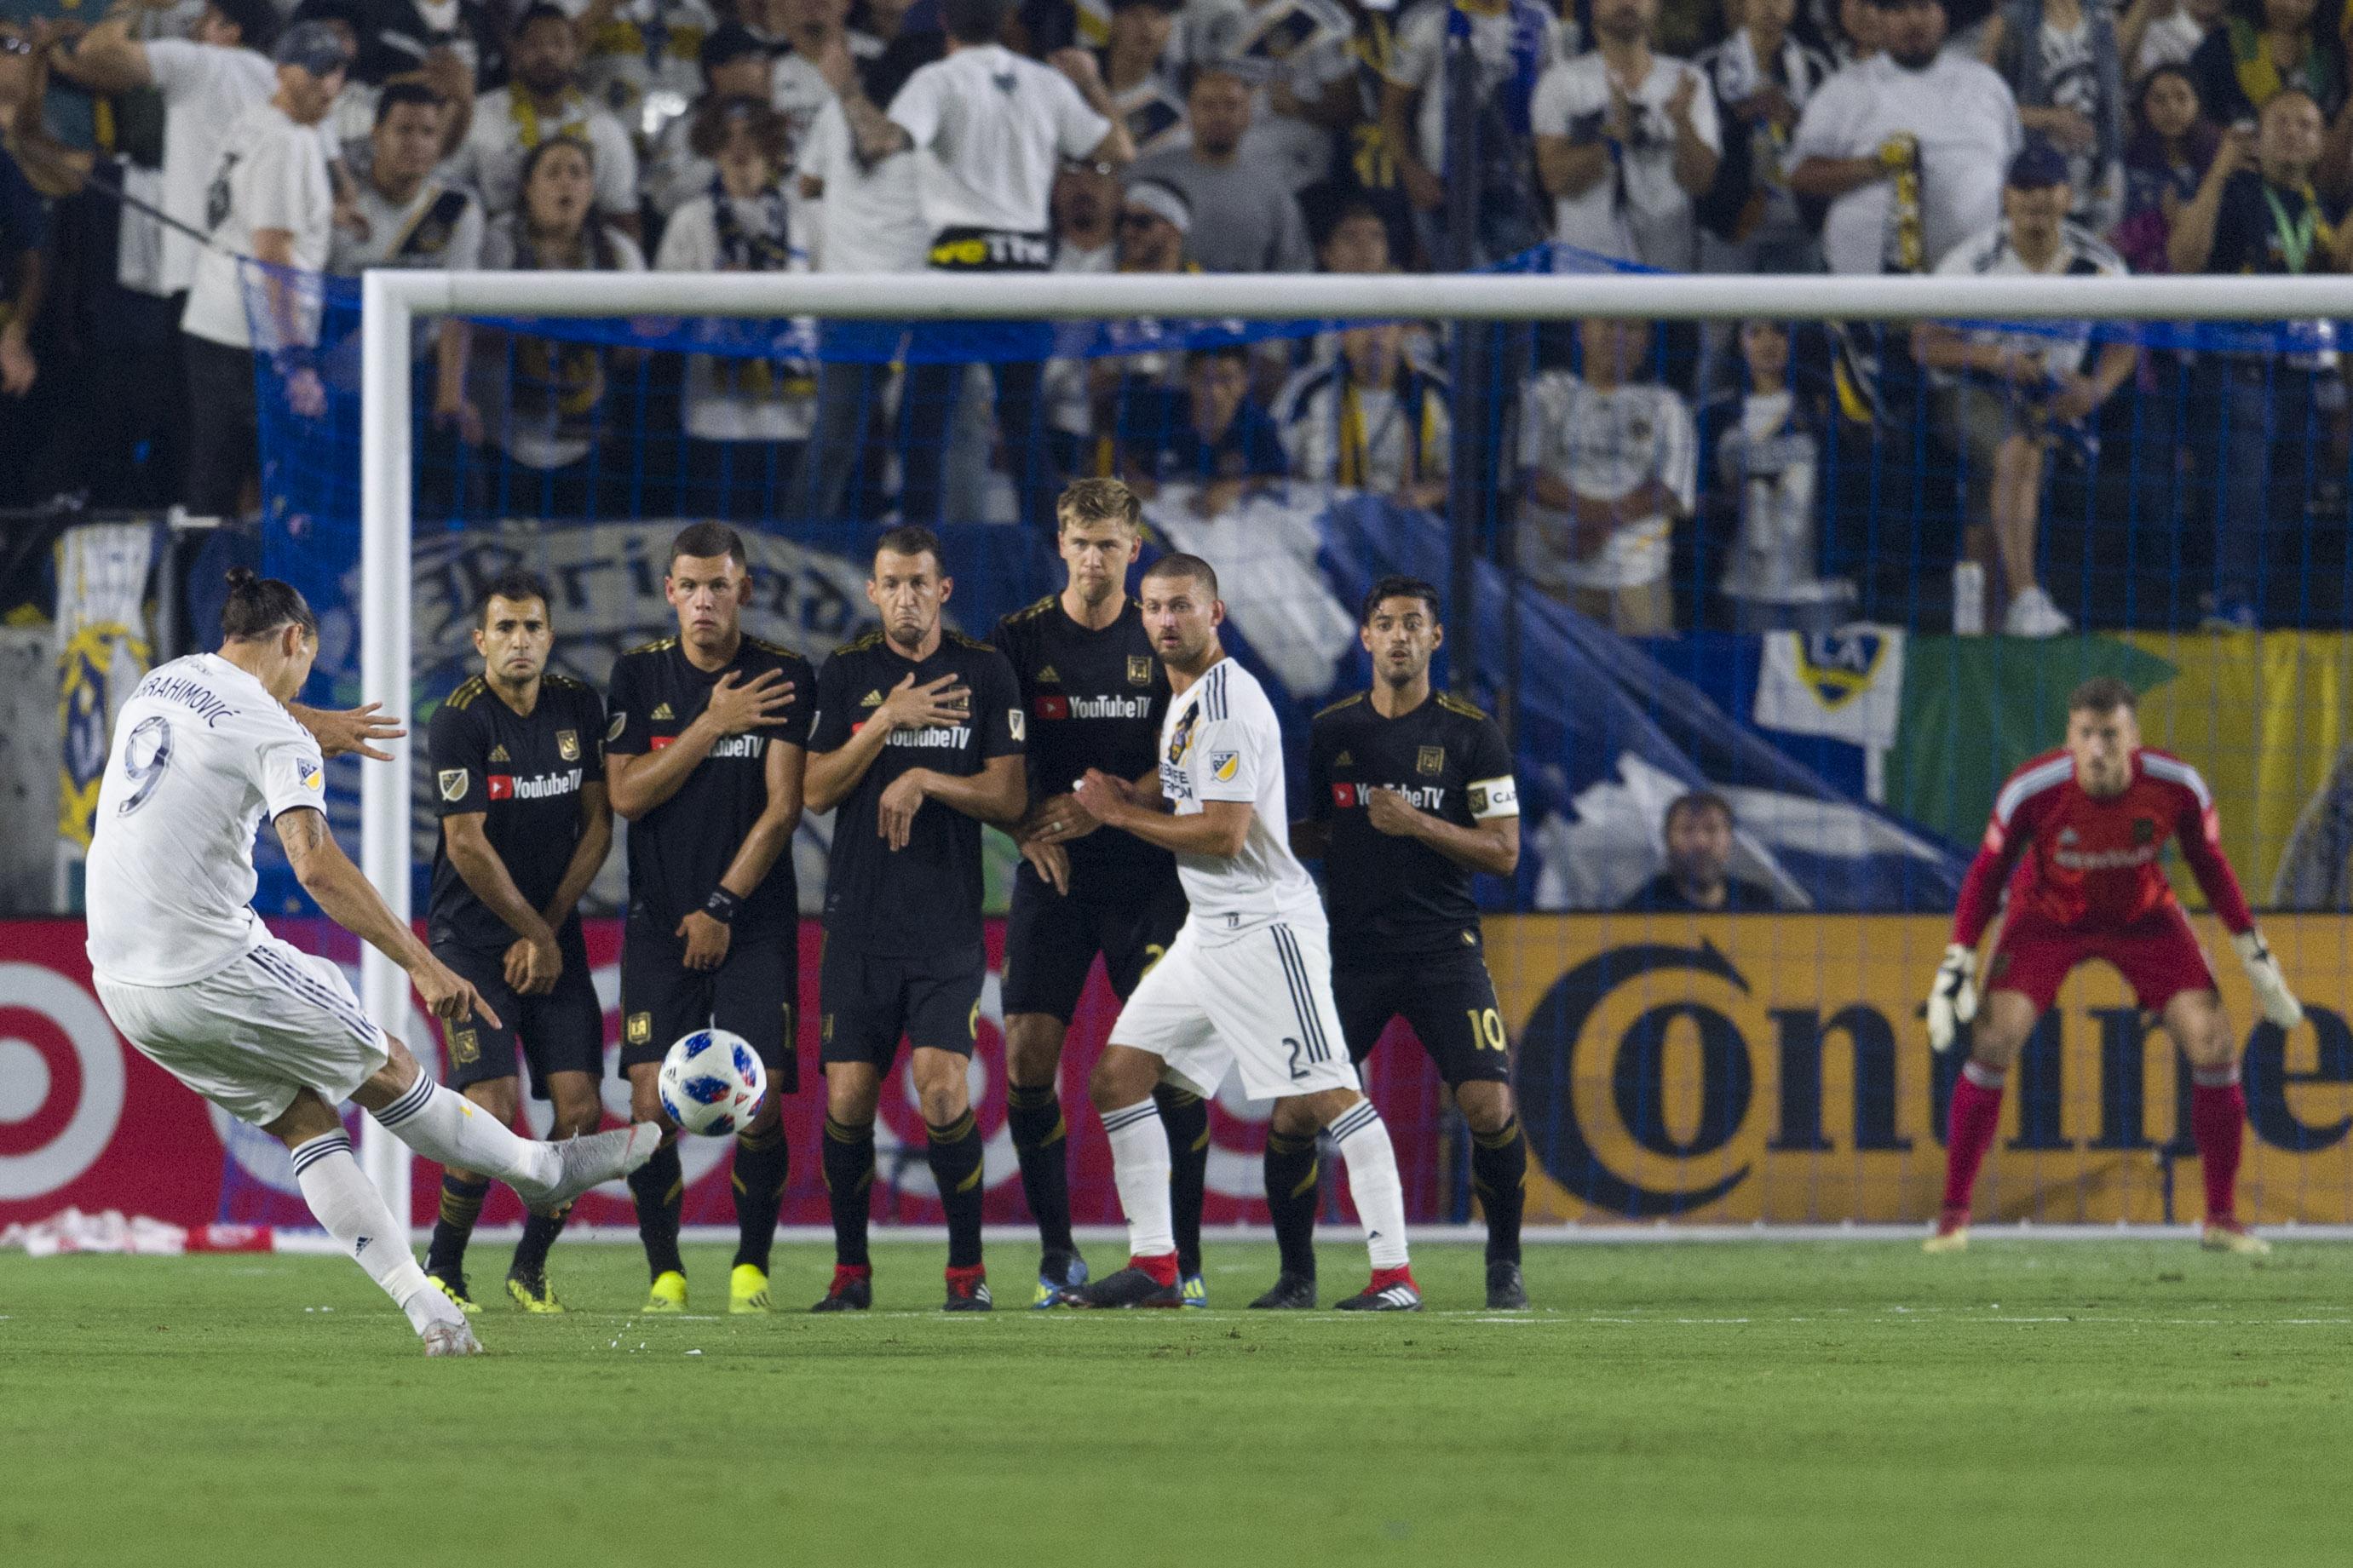 MLS: Los Angeles Galaxy - Zlatan Ibrahimovic